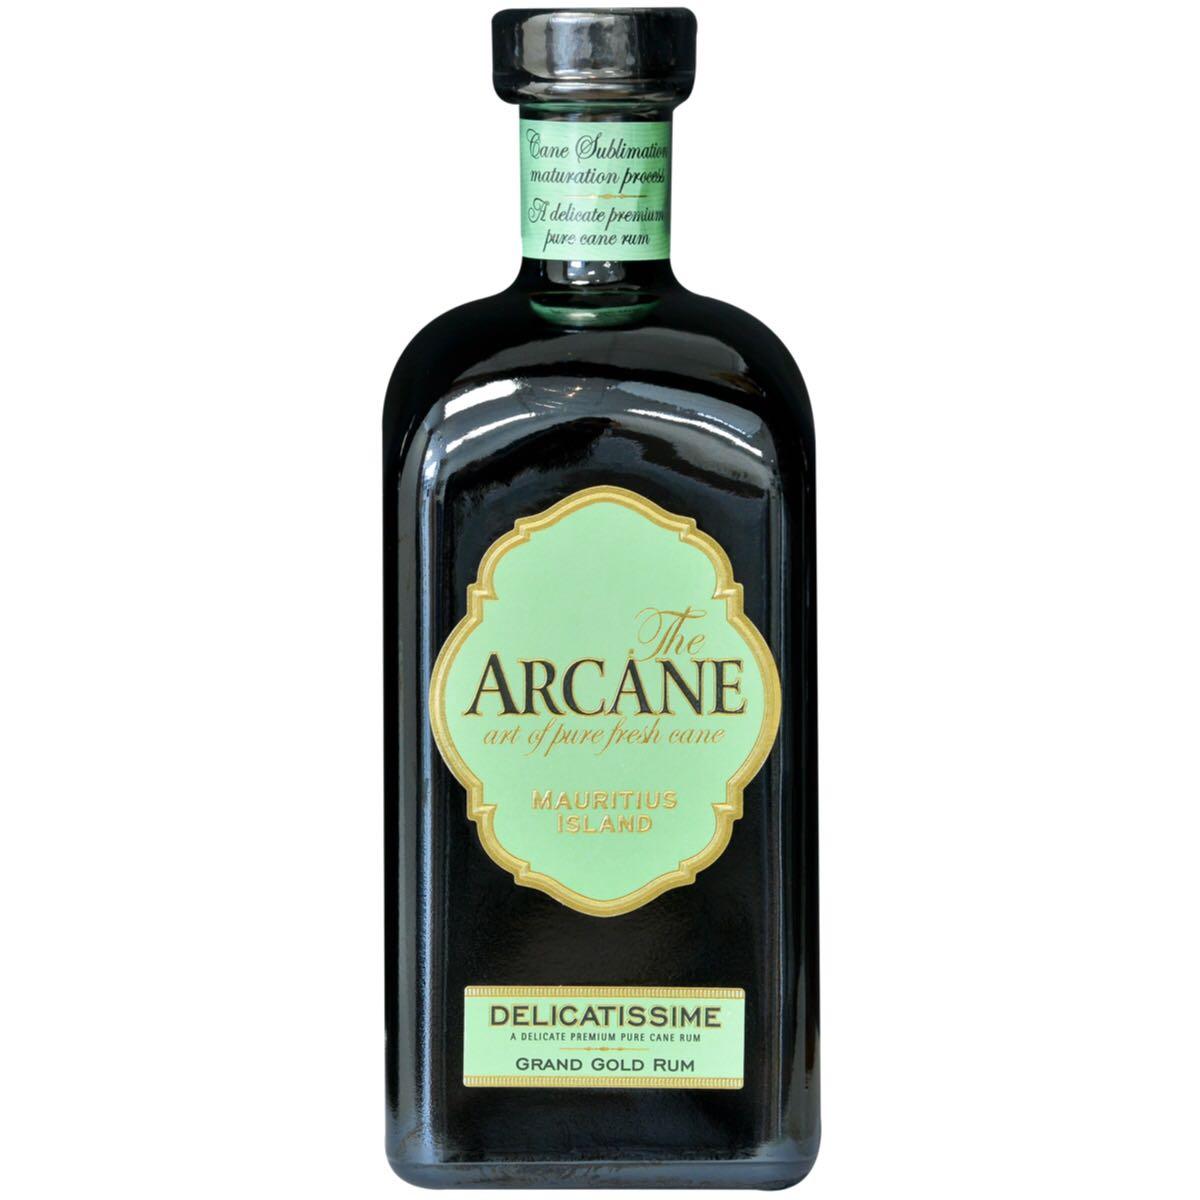 Bottle image of Arcane Delicatissime Grand Gold